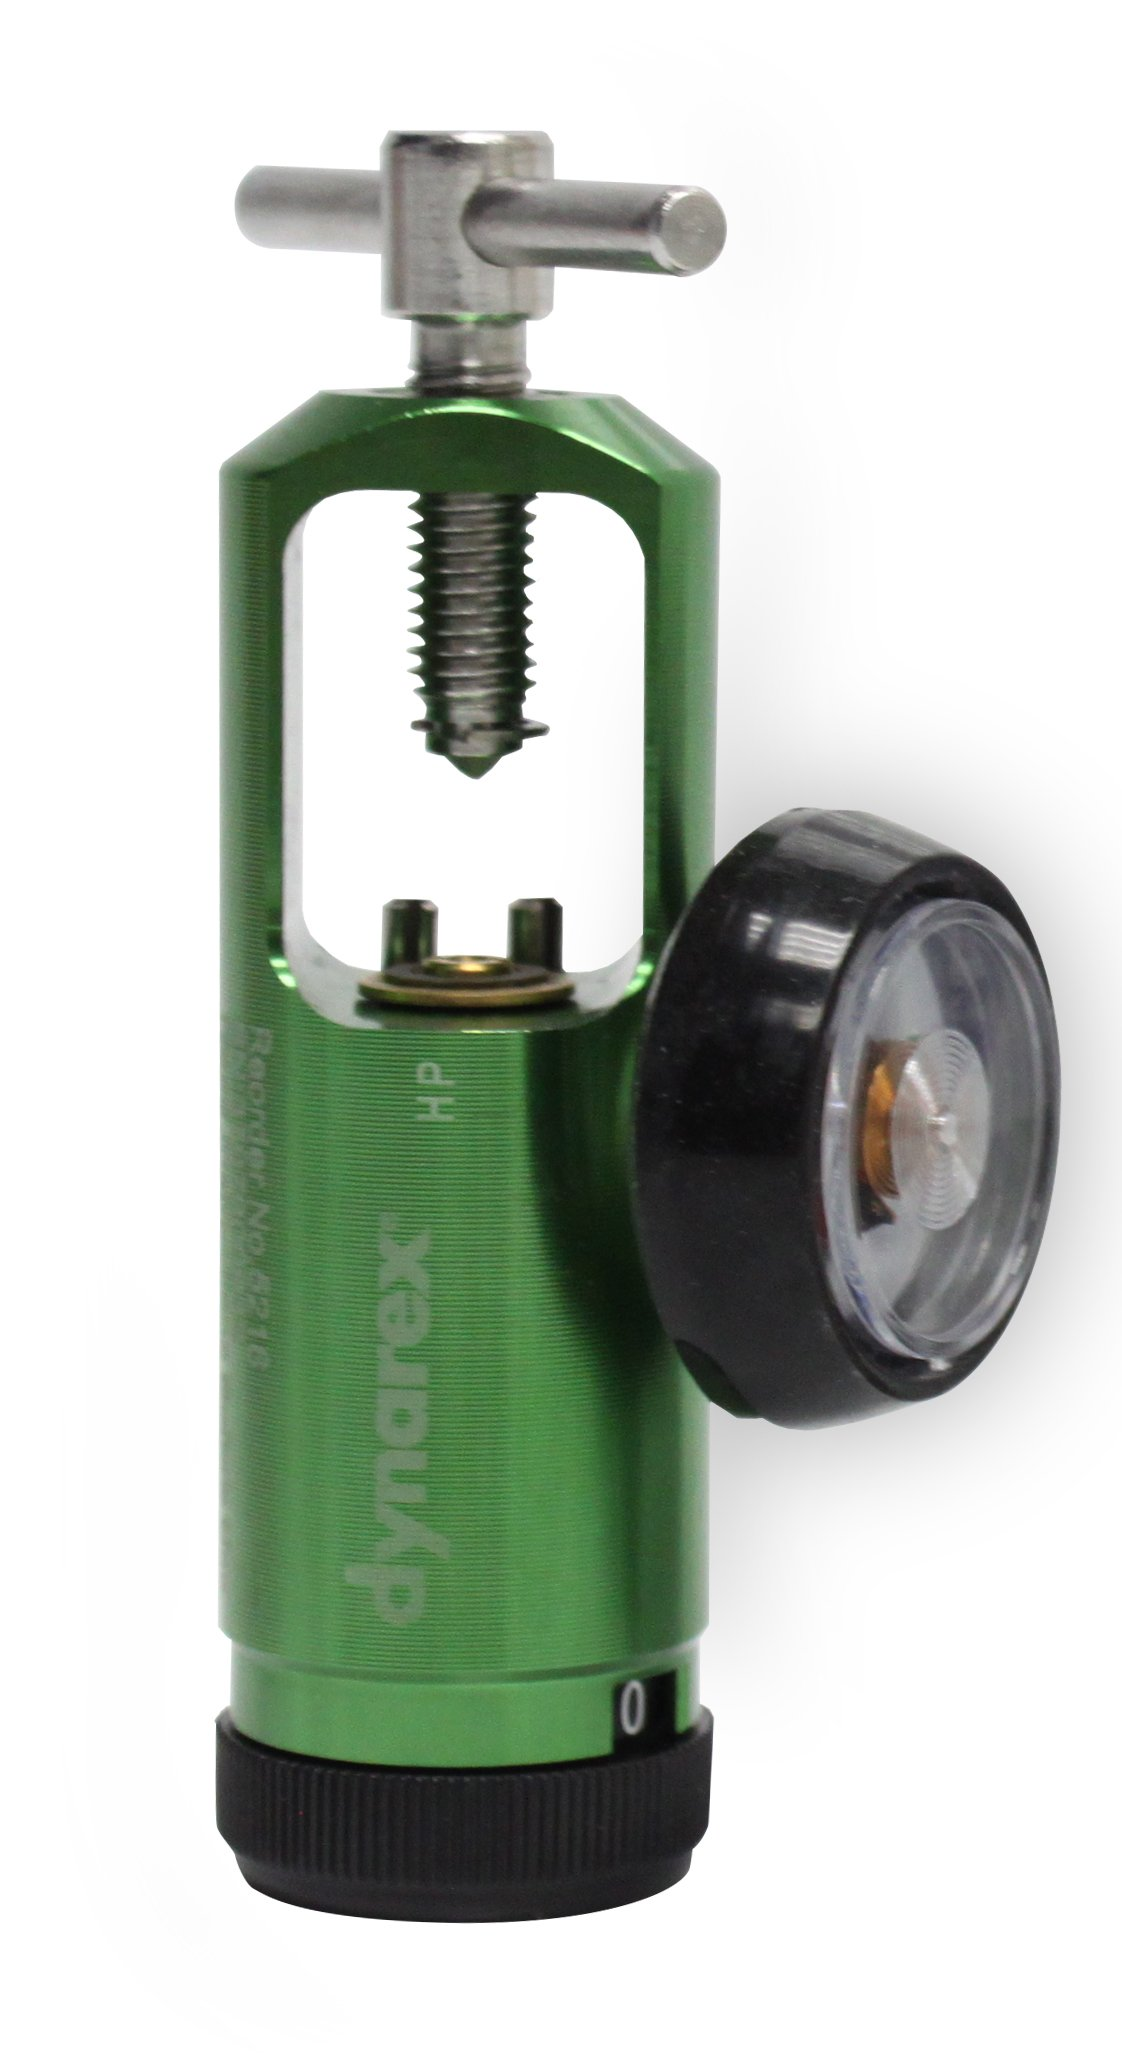 Dynarex Mini Oxygen Regulator, 0-15 Liters/Minute, 0.7 Pound